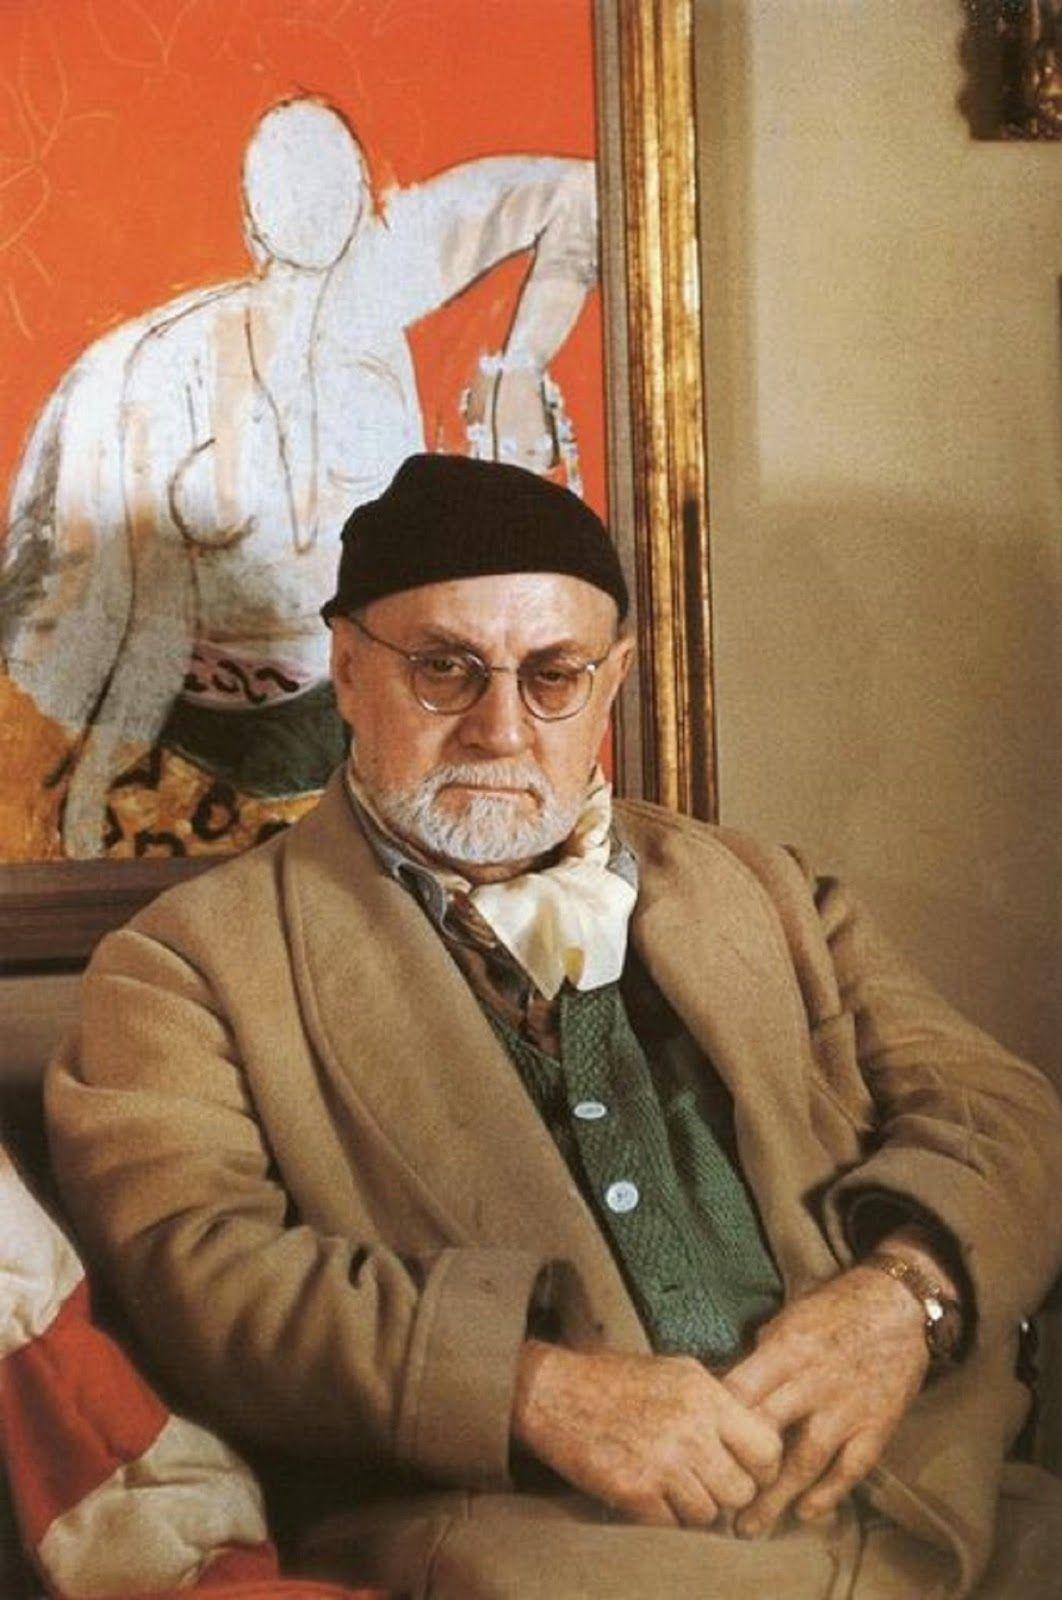 Henri Matisse by Gisele Freund